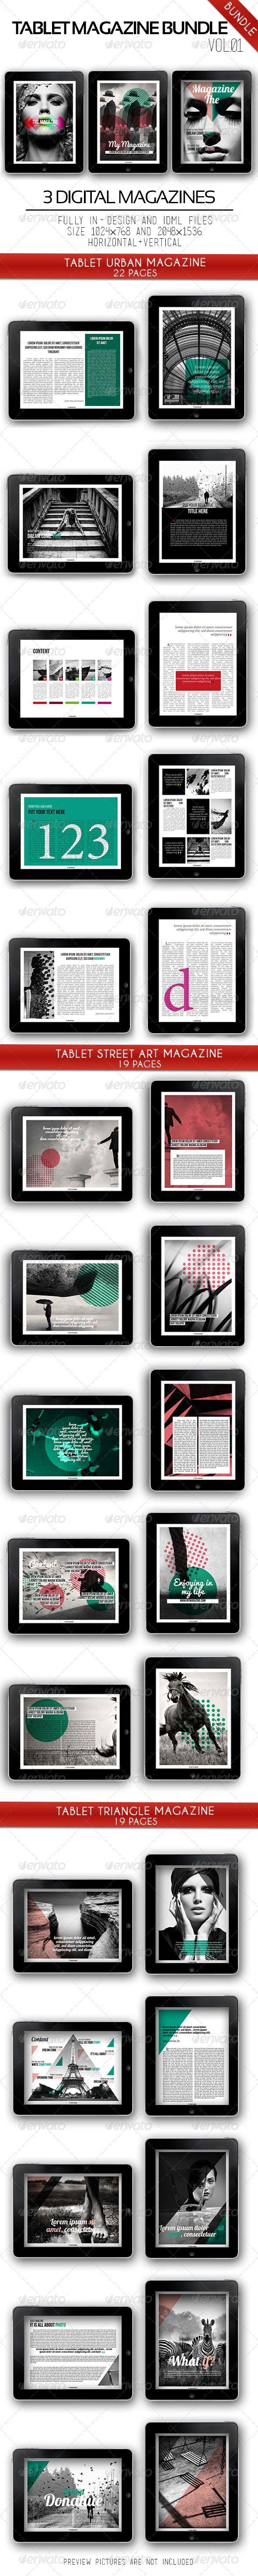 iPad & Tablet Magazine Bundle Vol.01 - Digital Magazines ePublishing